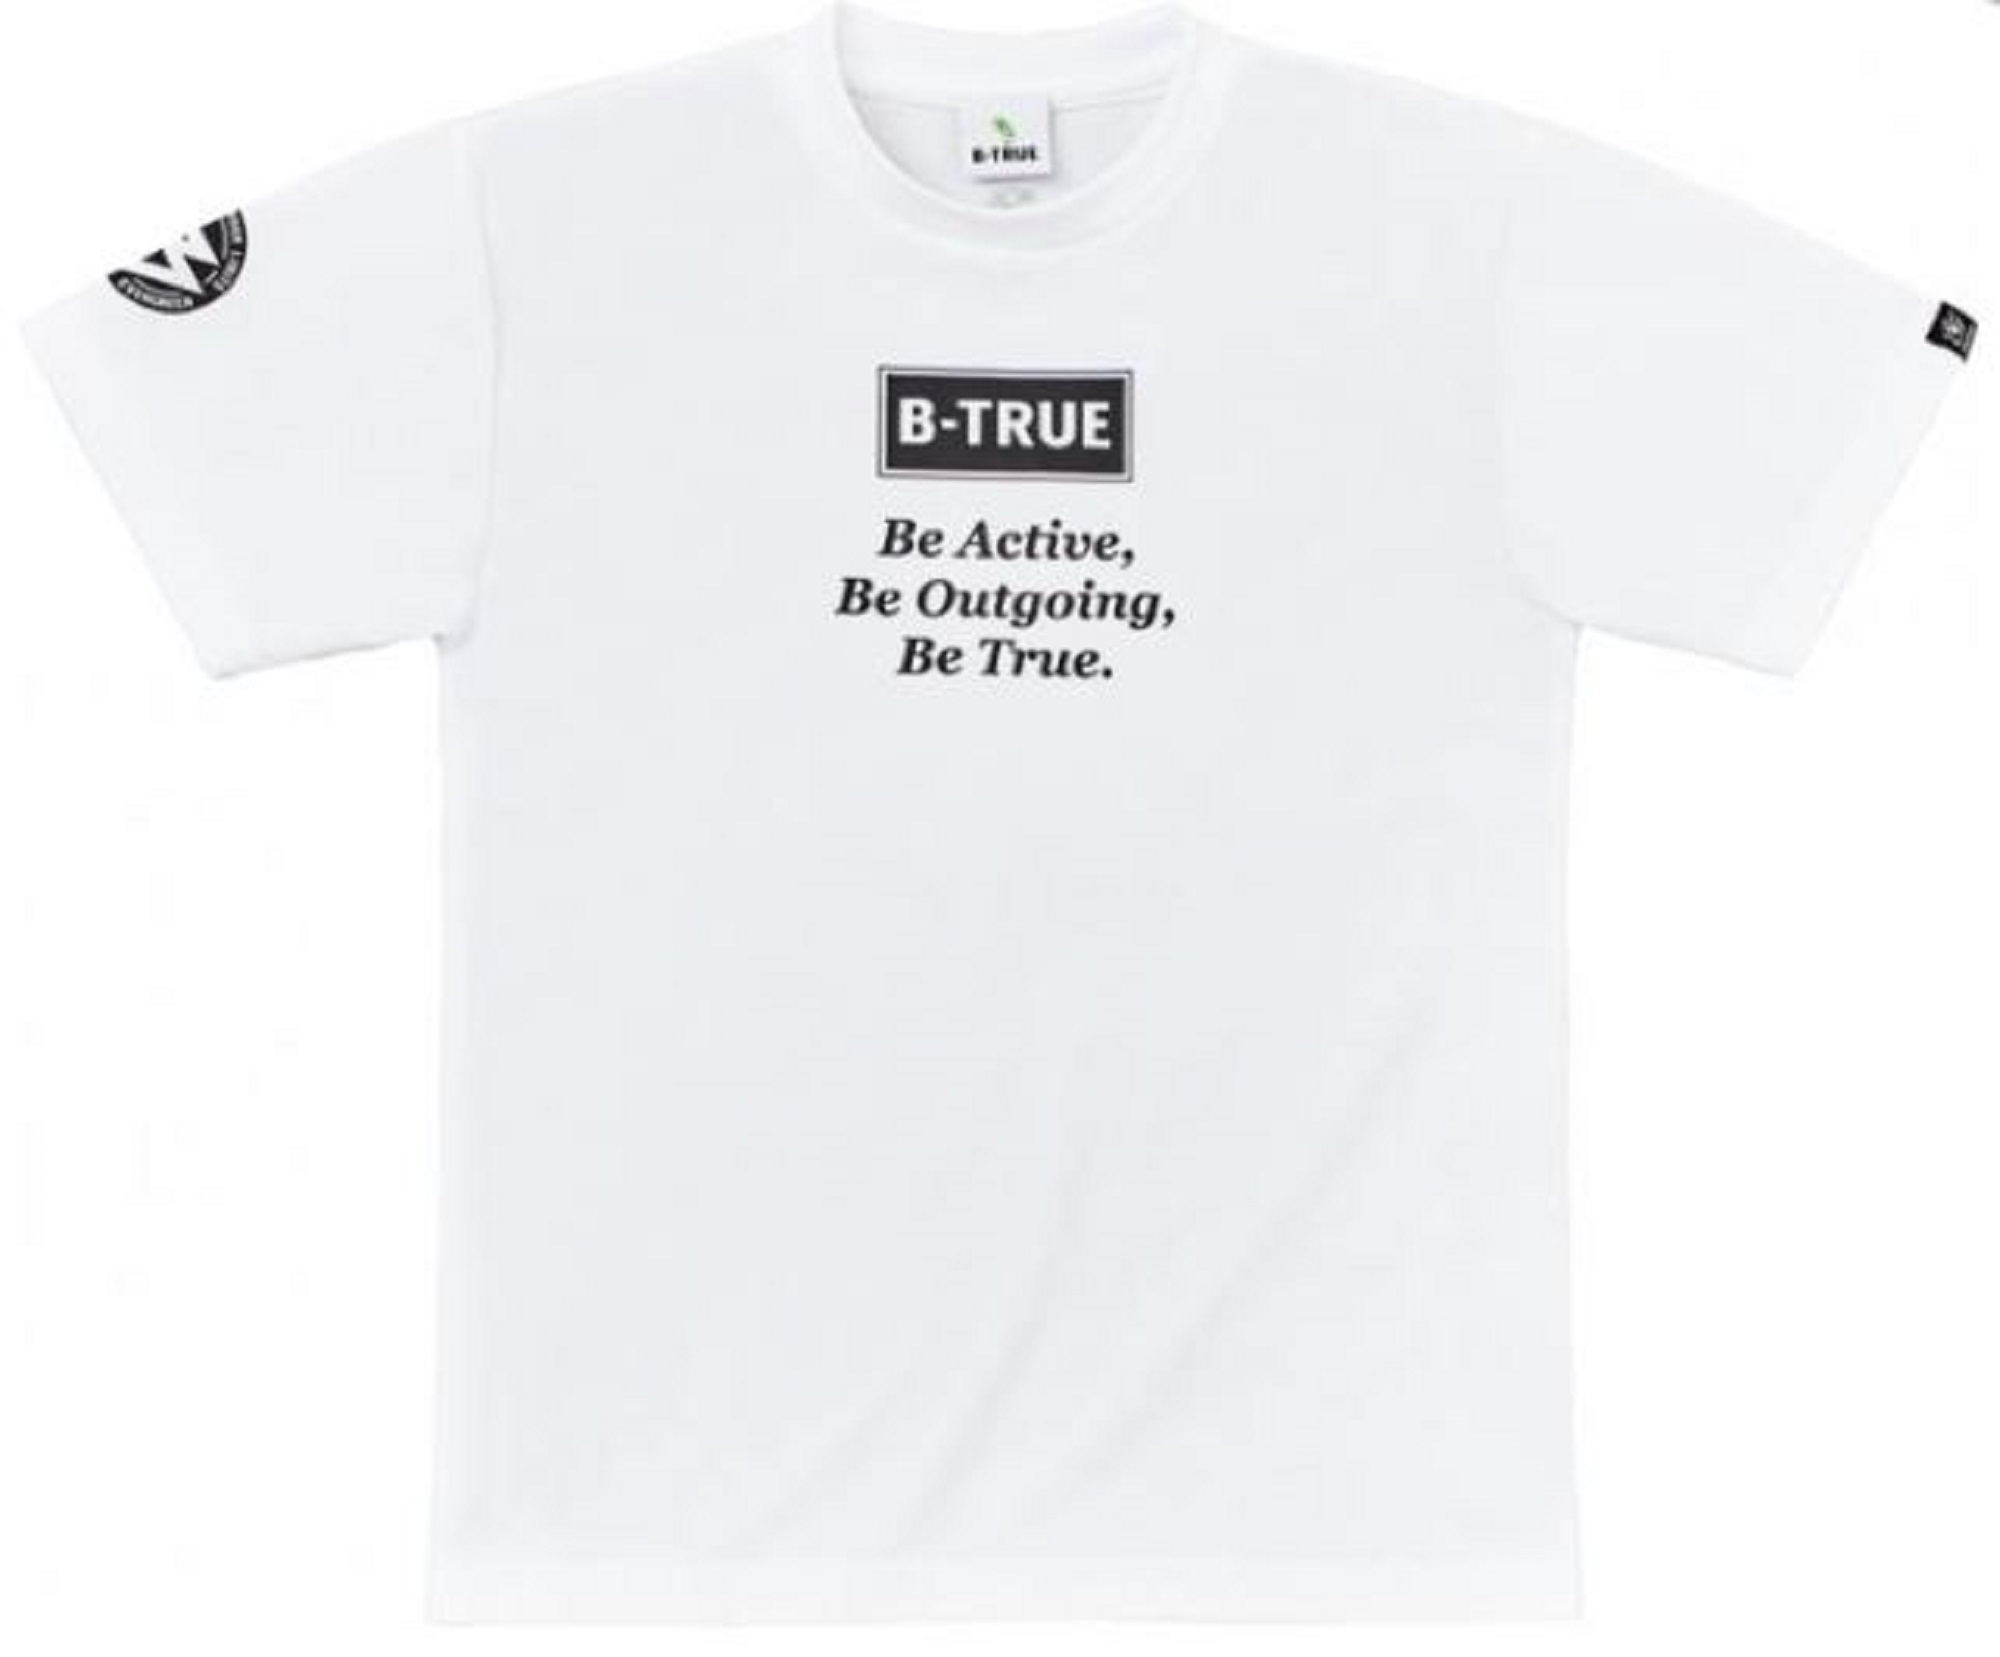 Evergreen T-Shirt Dry Fit Short Sleeve B-True D Type Size XXL White (4920)